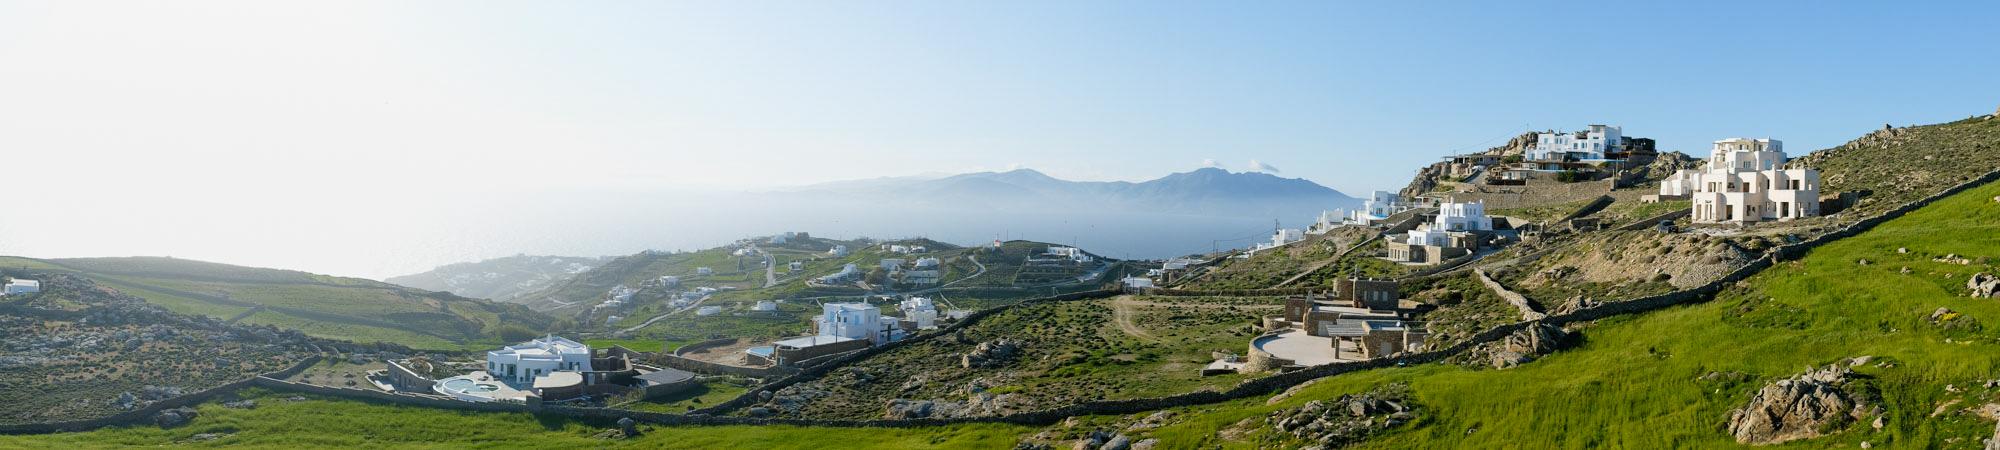 Mykonos Kastro View Location